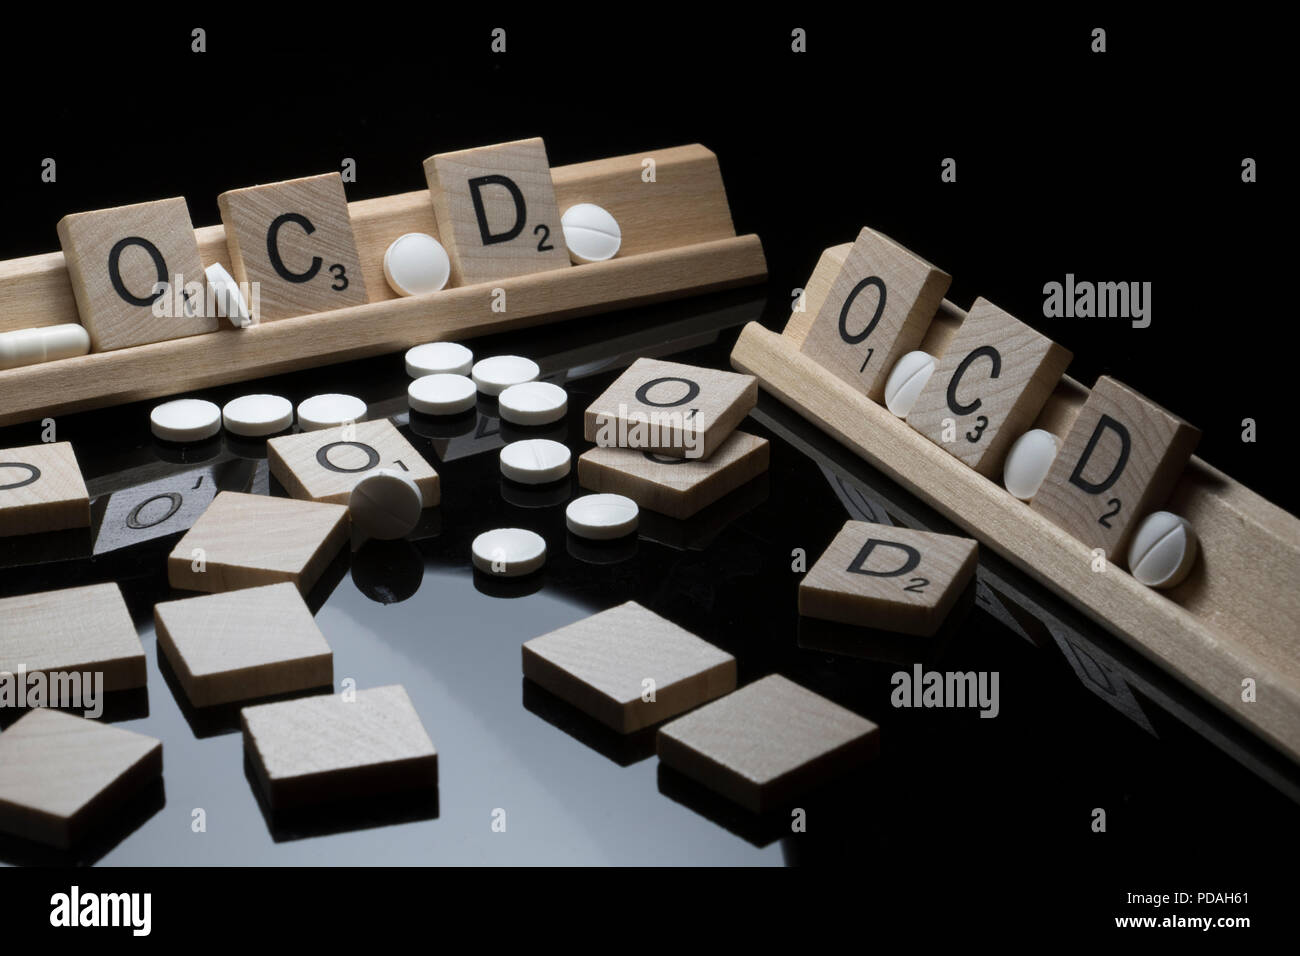 Scrabble letters spelling OCD with white prescription pills. Mental health awareness concept. - Stock Image